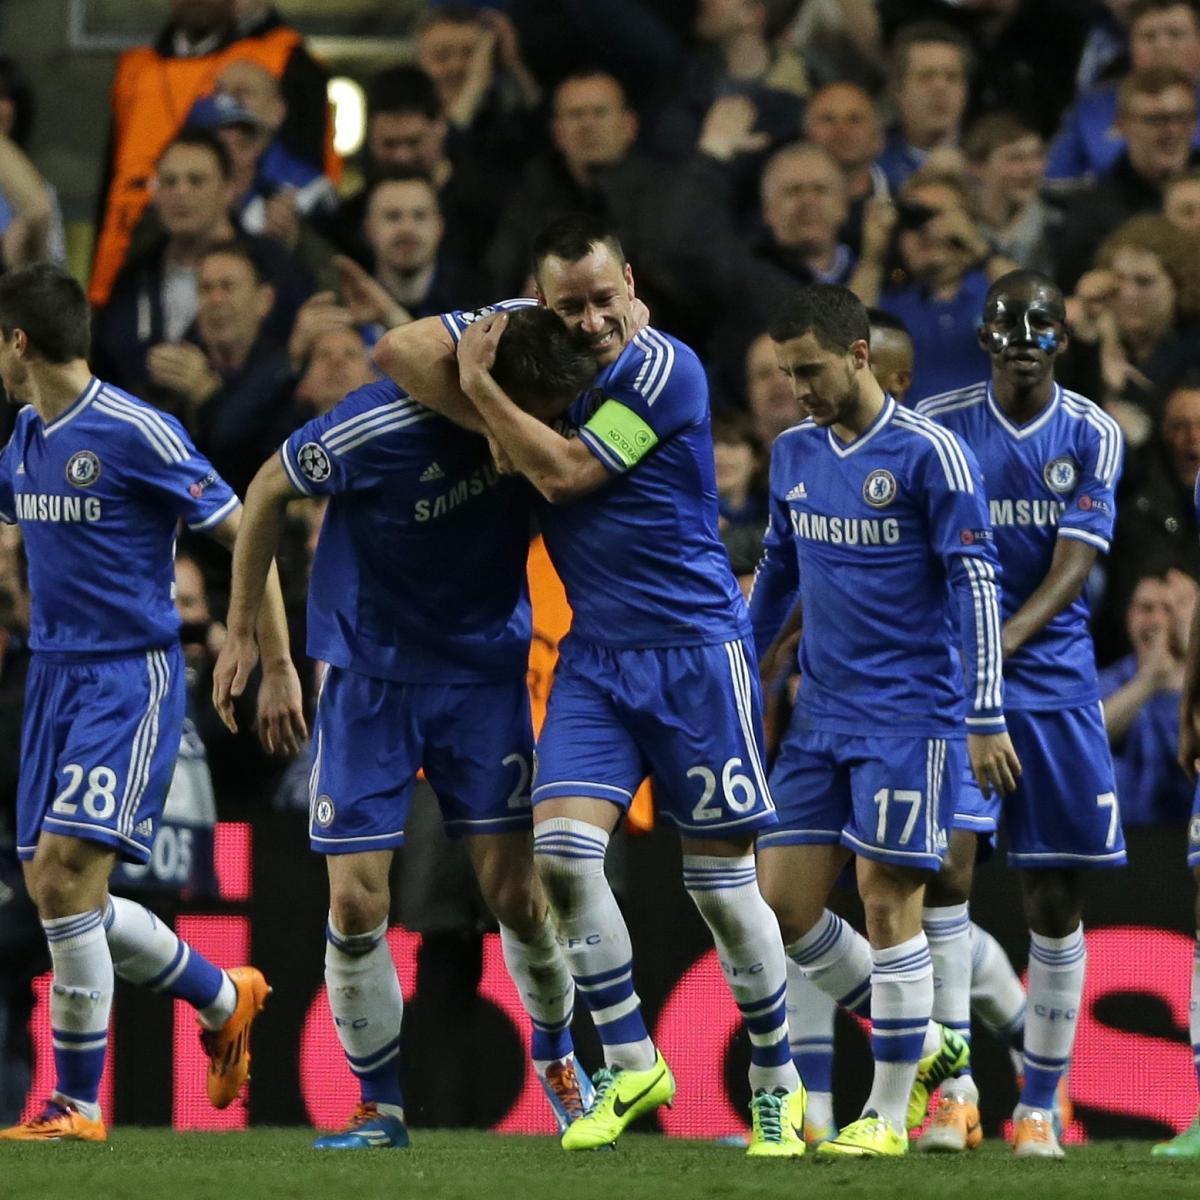 Psg Vs Chelsea Live Score Highlights From Champions: PSG Vs. Chelsea: Live Stream Info, Prediction, Top Stats